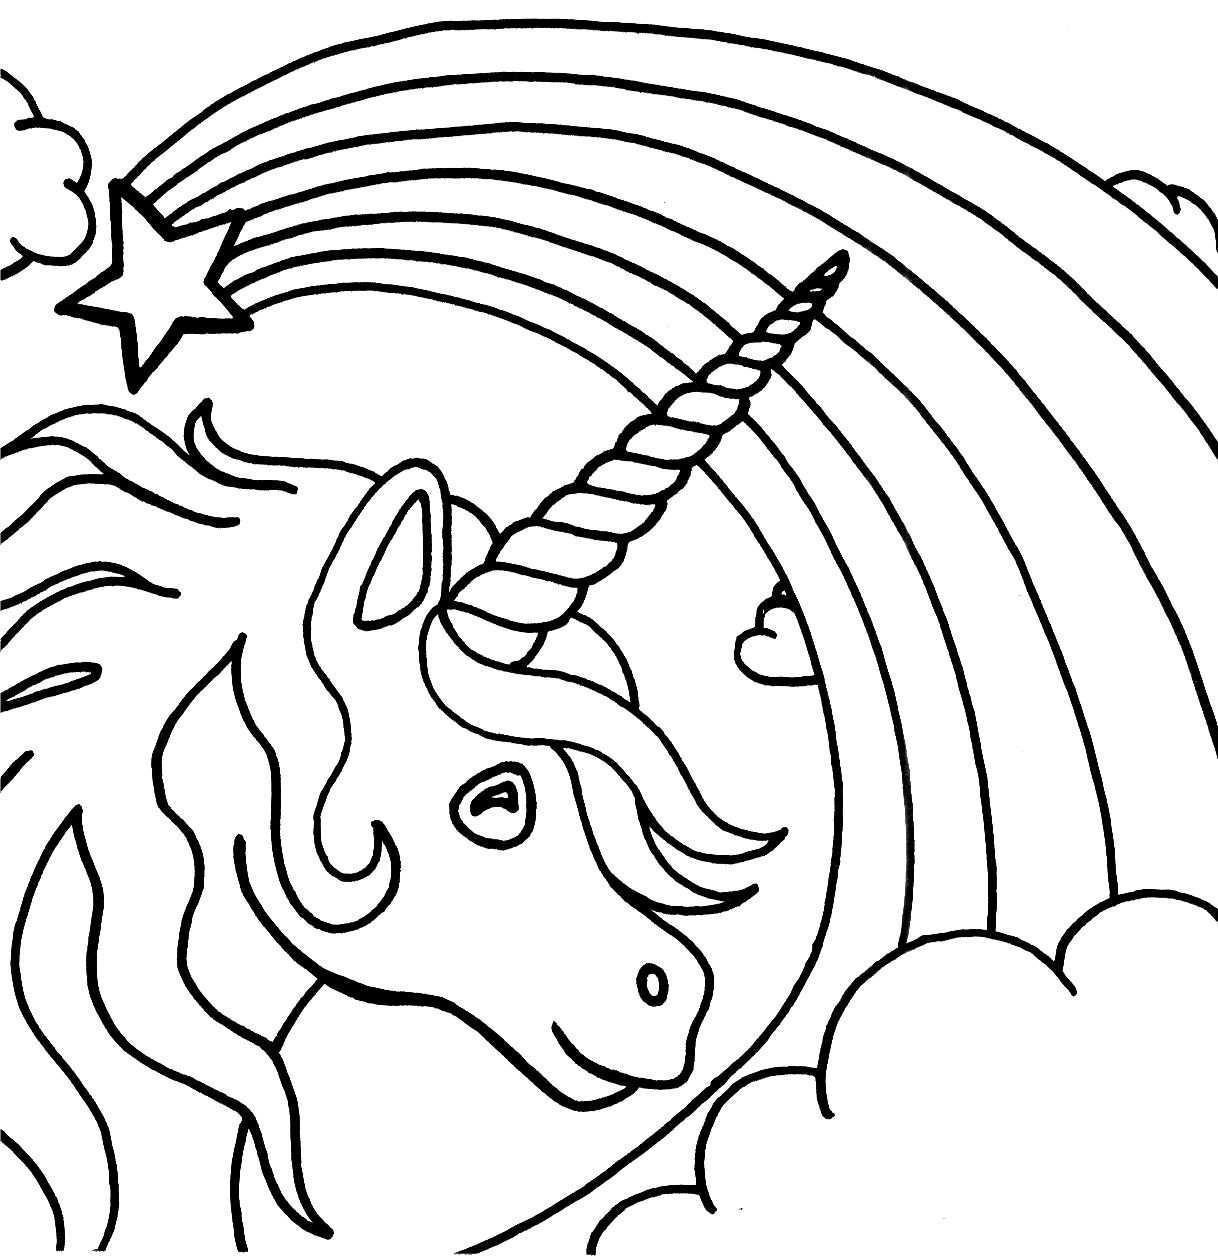 Free Printable Unicorn Coloring Pages For Kids Met Afbeeldingen